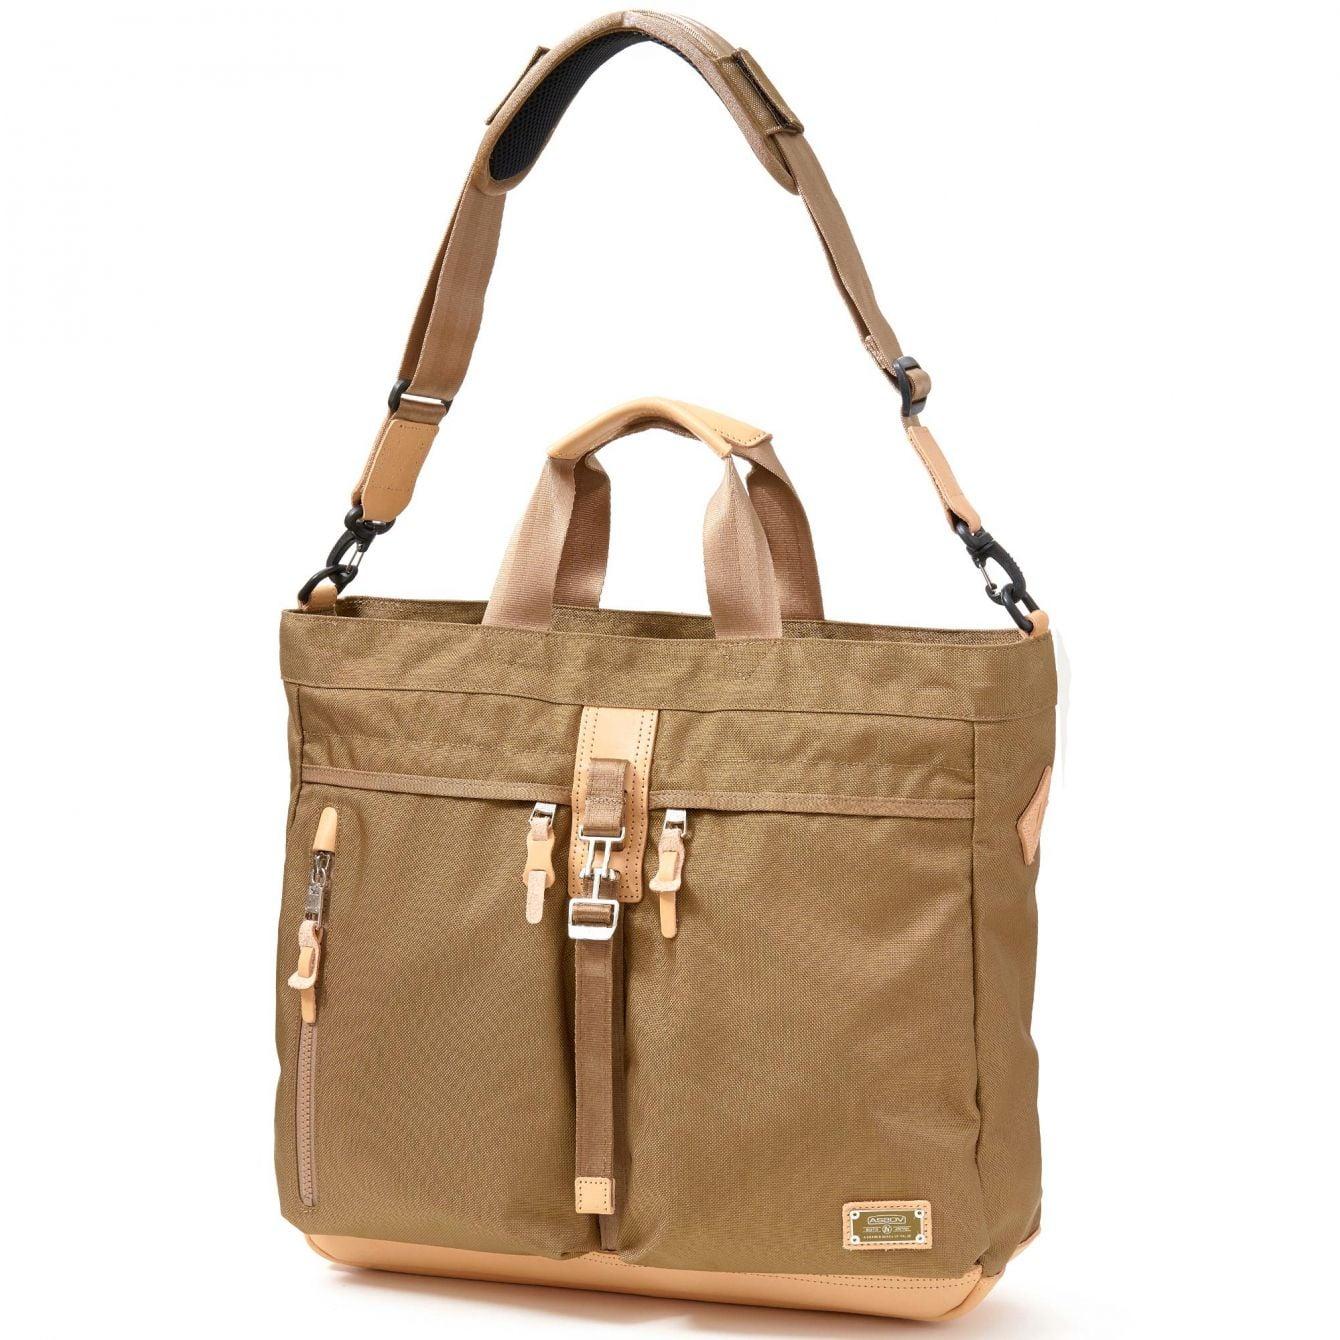 # 「AS2OV」包袋品牌獨家彈道尼龍:2WAY SHOULDER & BODY BAG 新品上市 3